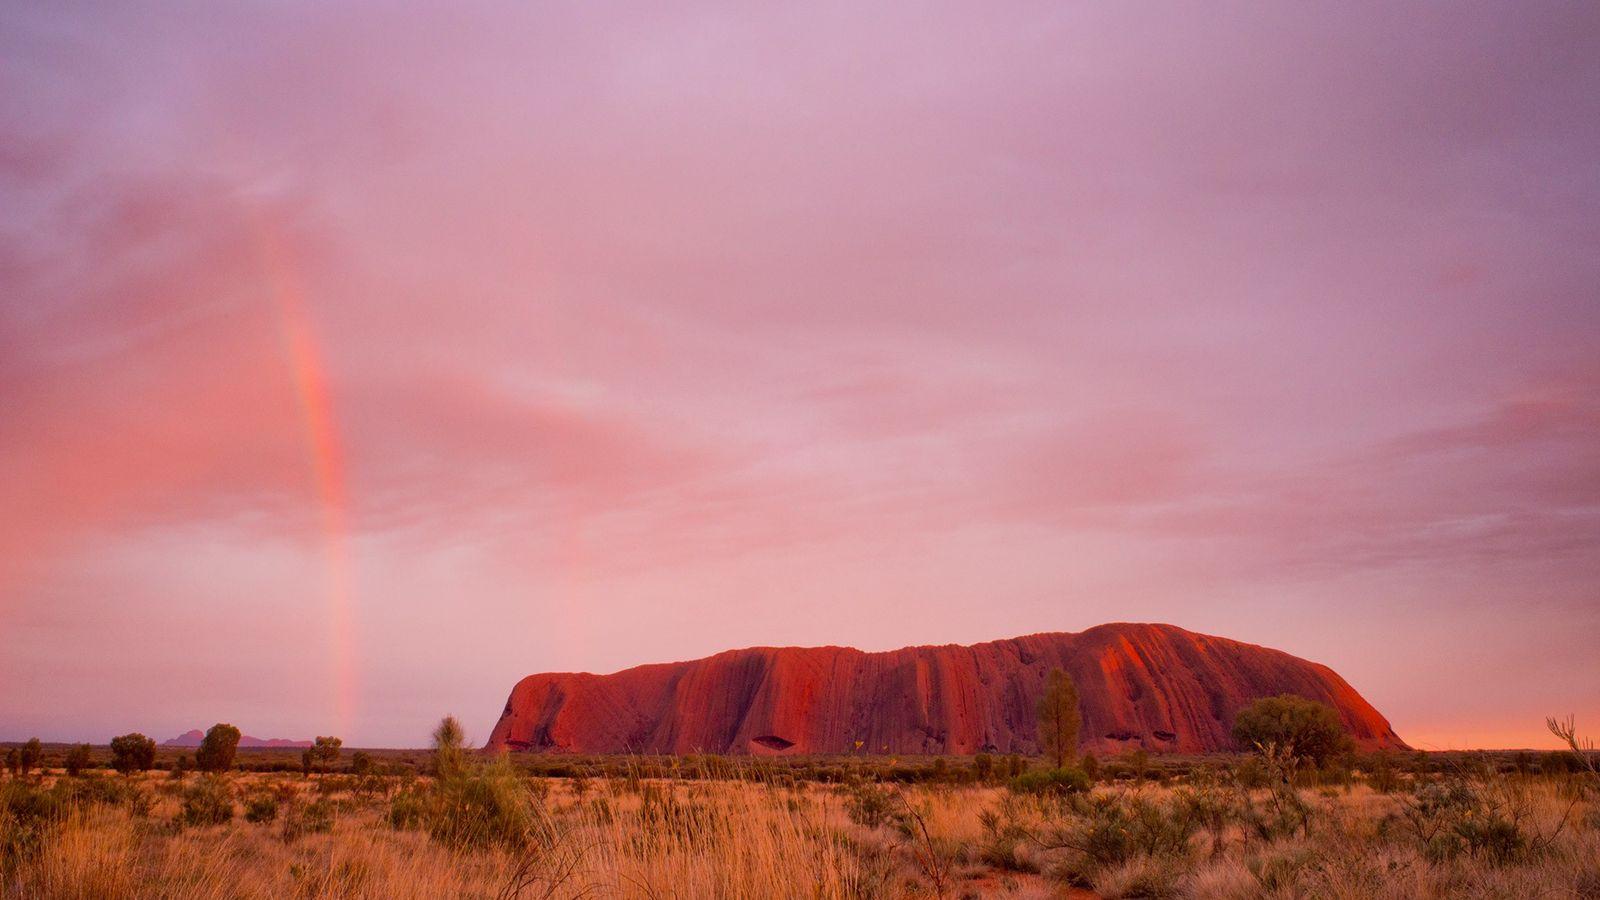 Uluru, um enorme monólito de arenito na Austrália central, sagrado para os povos aborígenes, será fechado ...